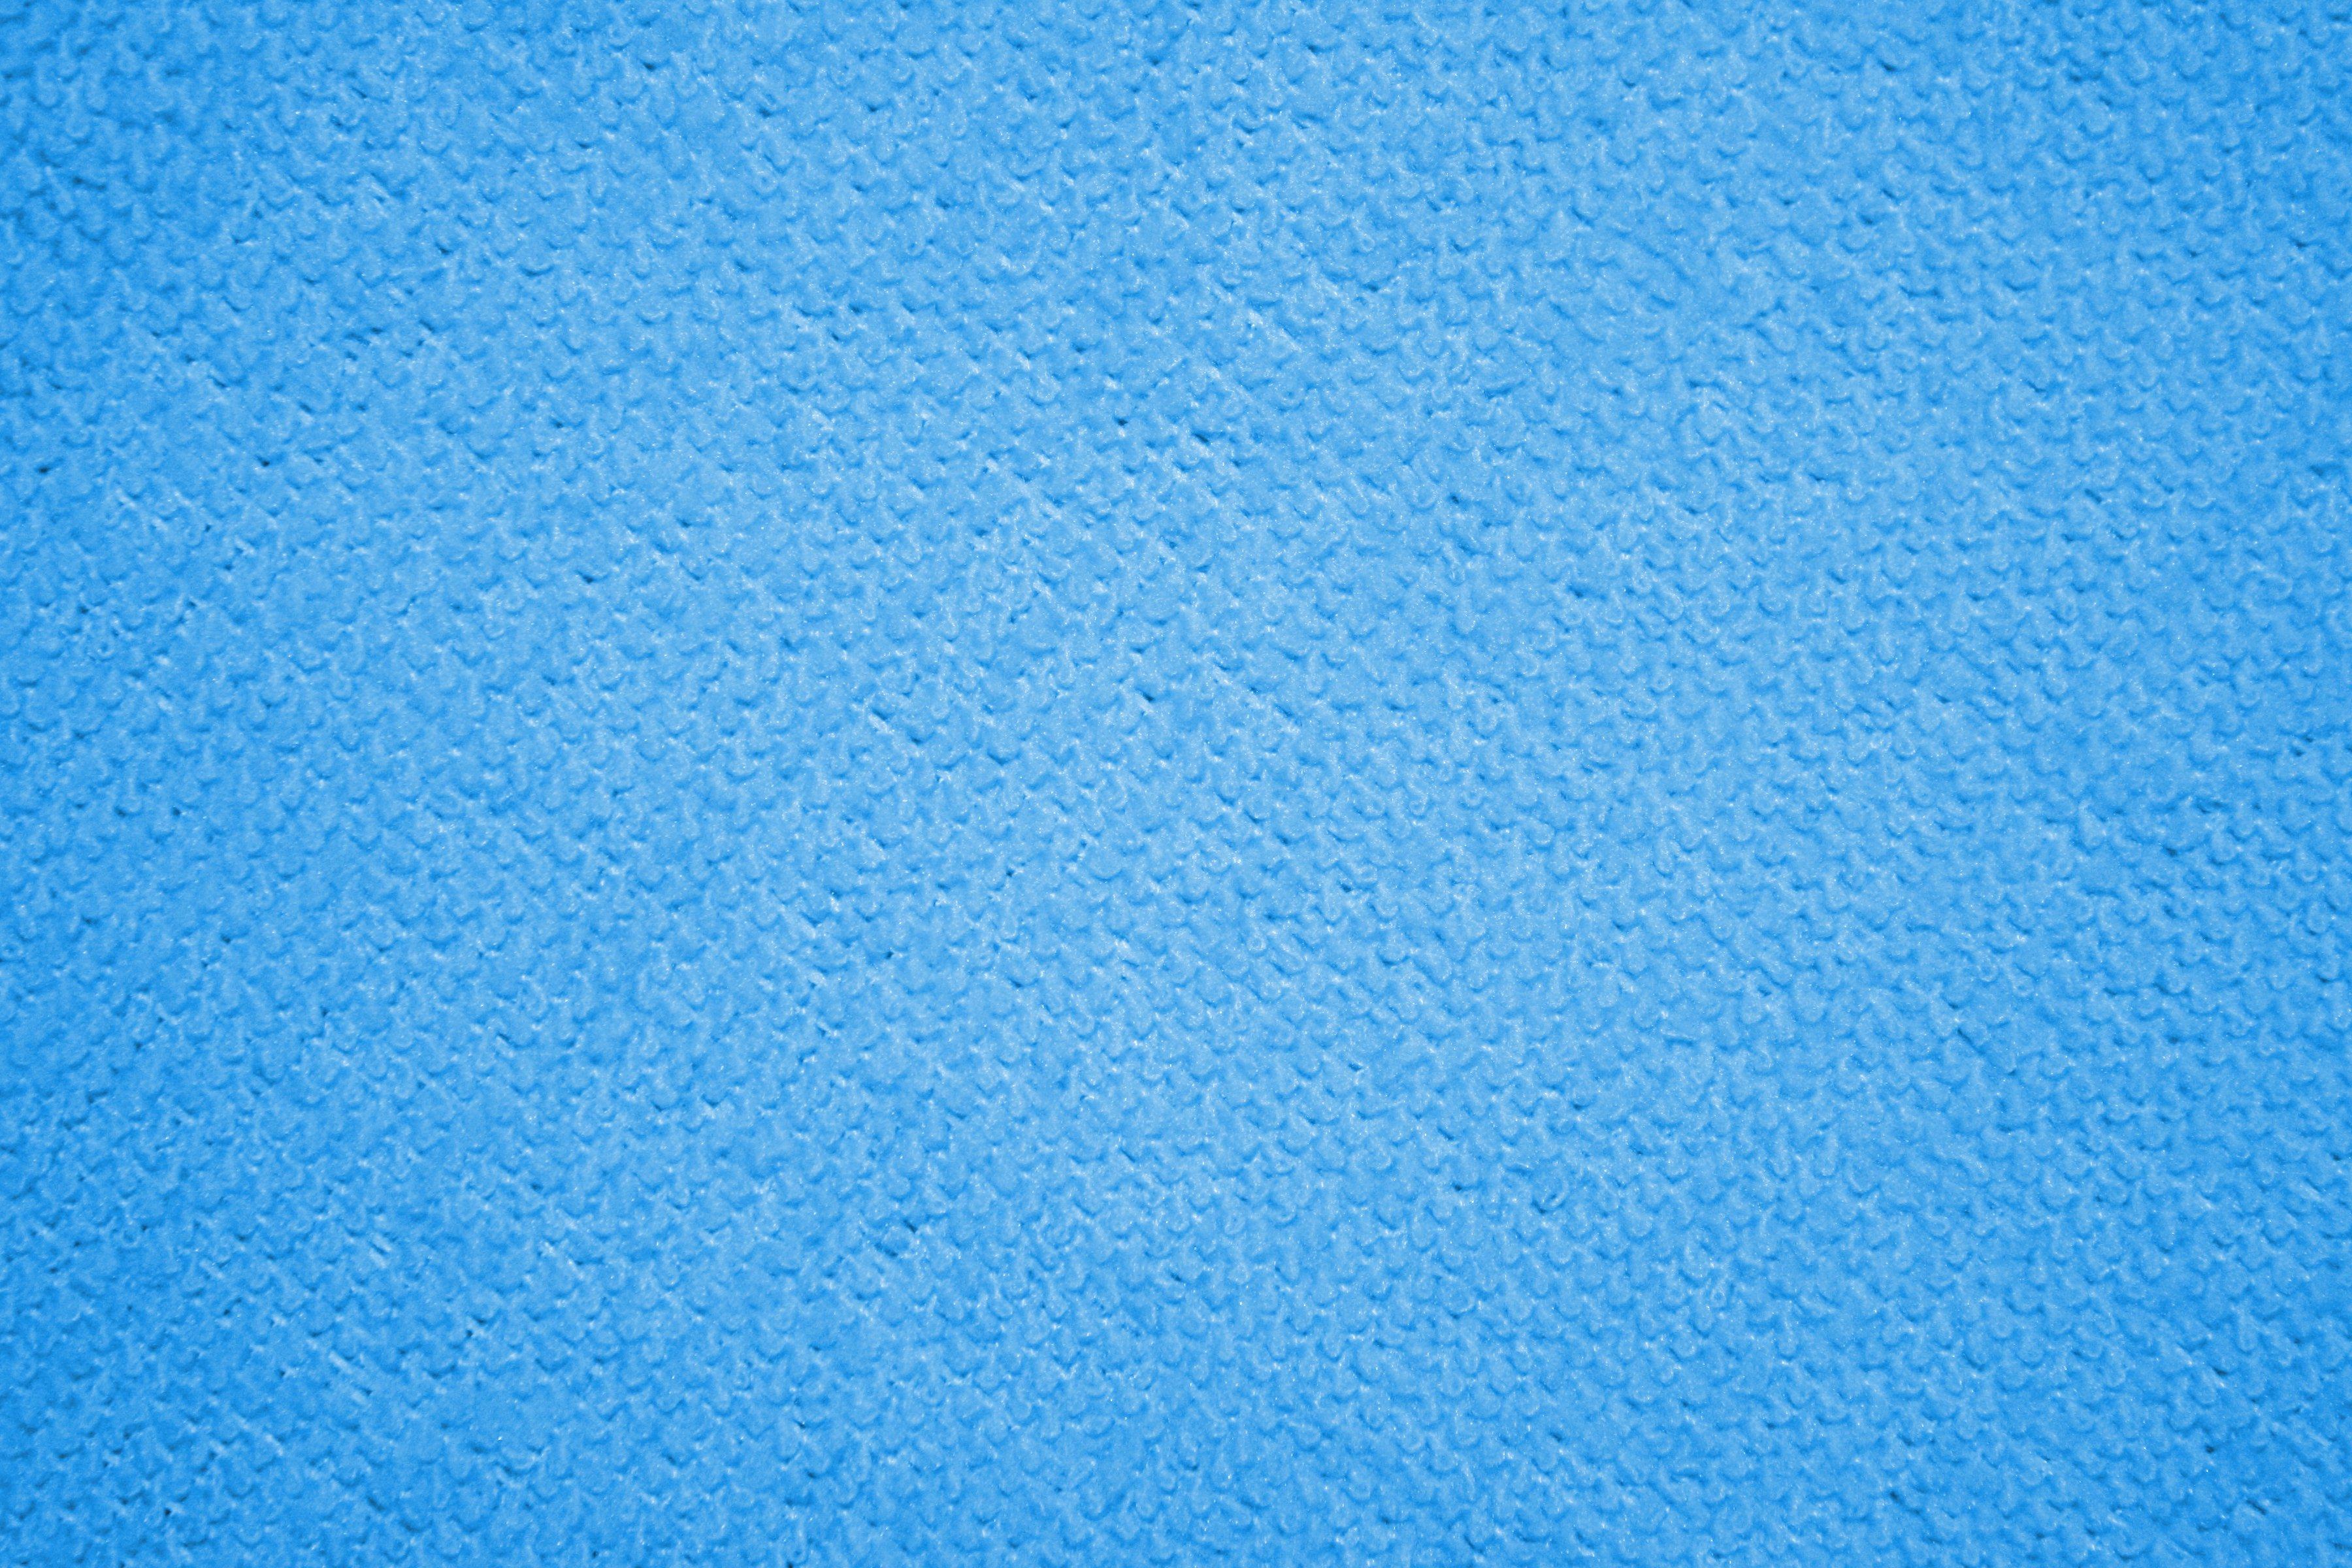 Azure Blue Microfiber Cloth Fabric Texture Picture | Free Photograph ...